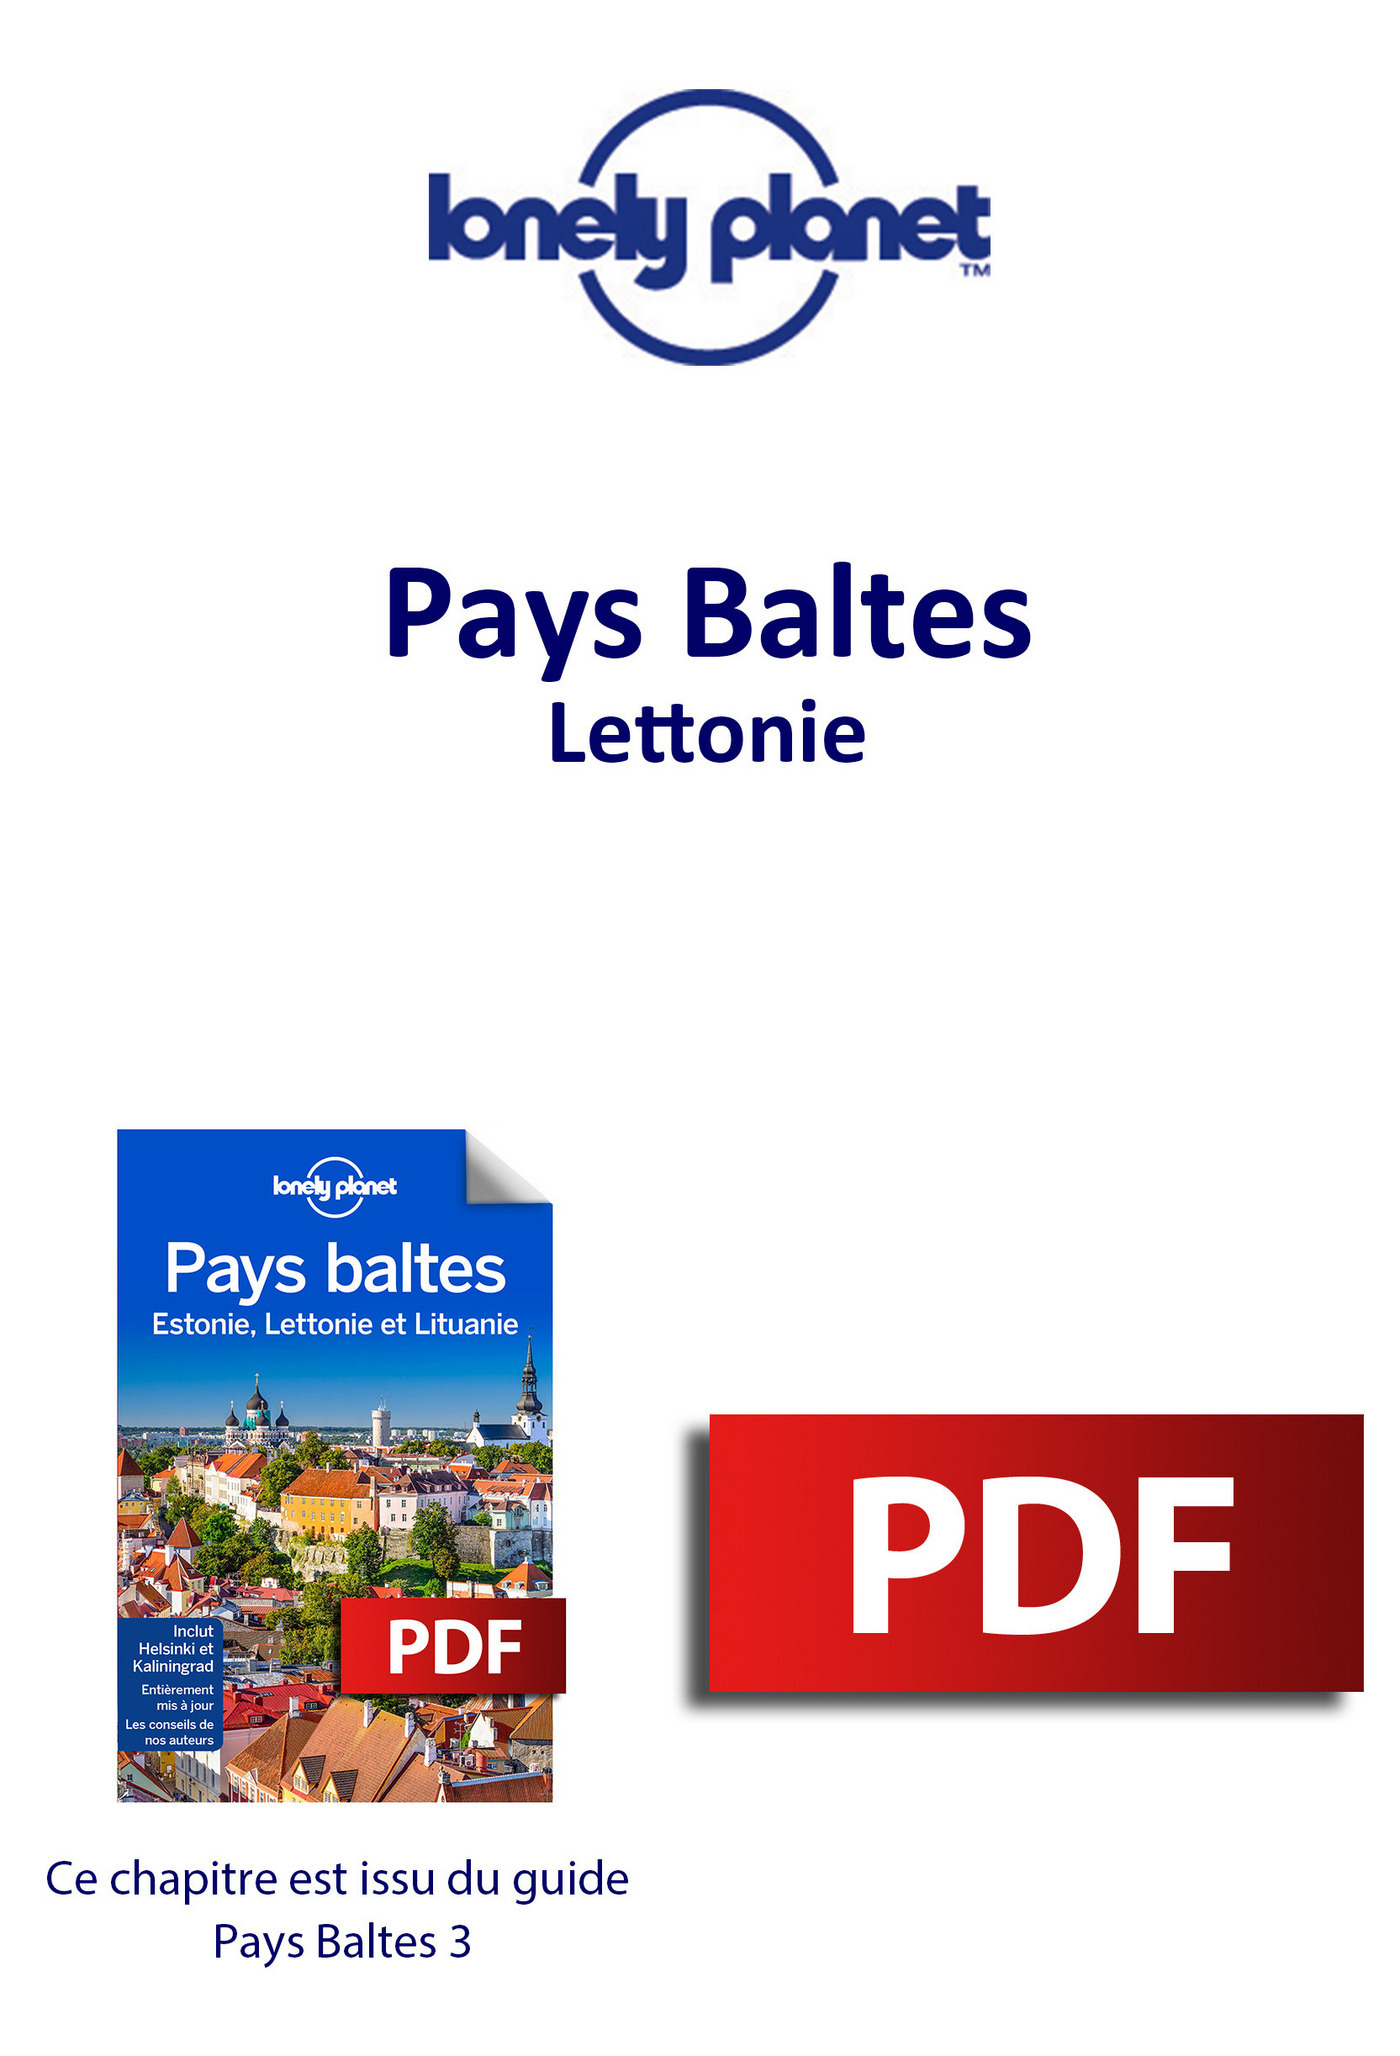 Pays Baltes - Lettonie